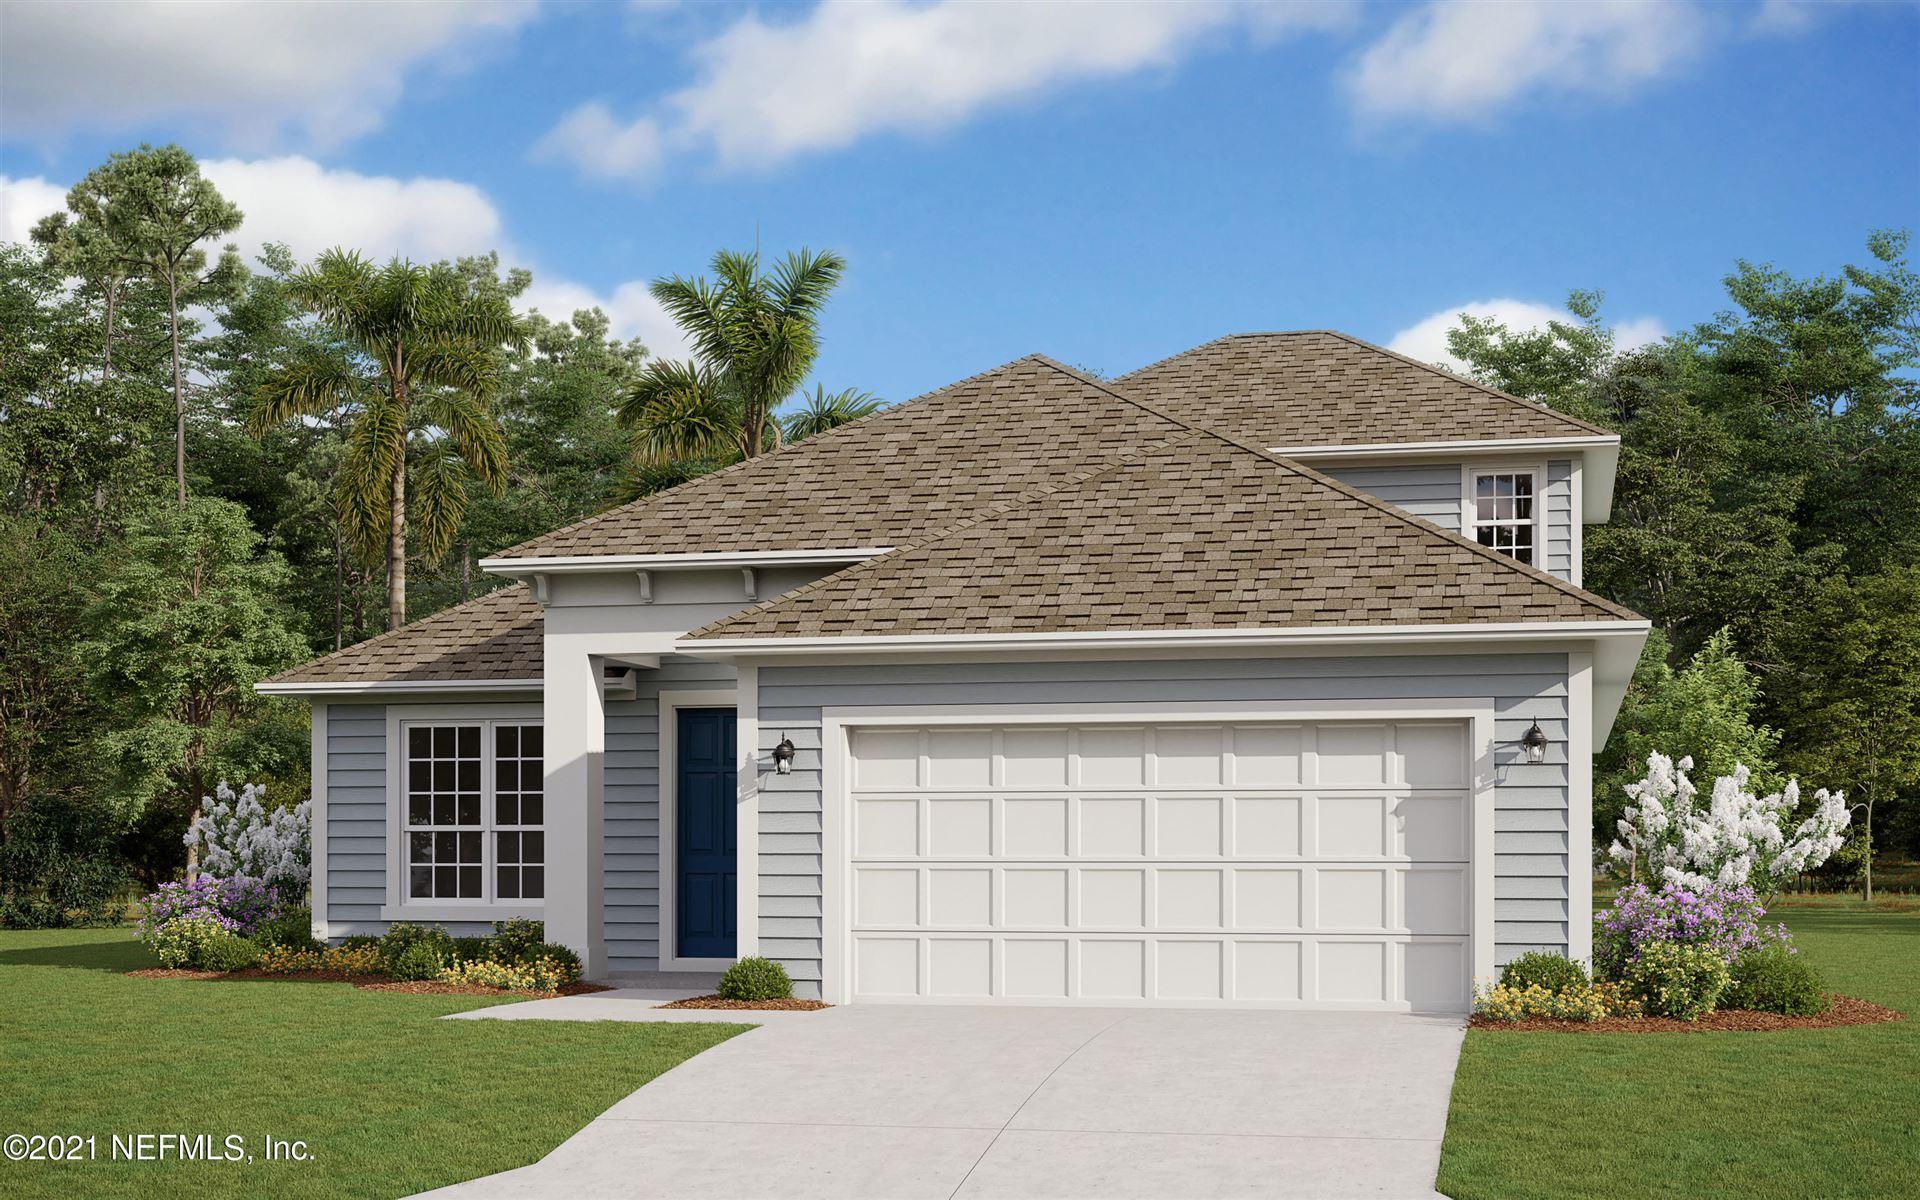 2883 COPPERWOOD AVE #Lot No: 060, Orange Park, FL 32073 - MLS#: 1097299